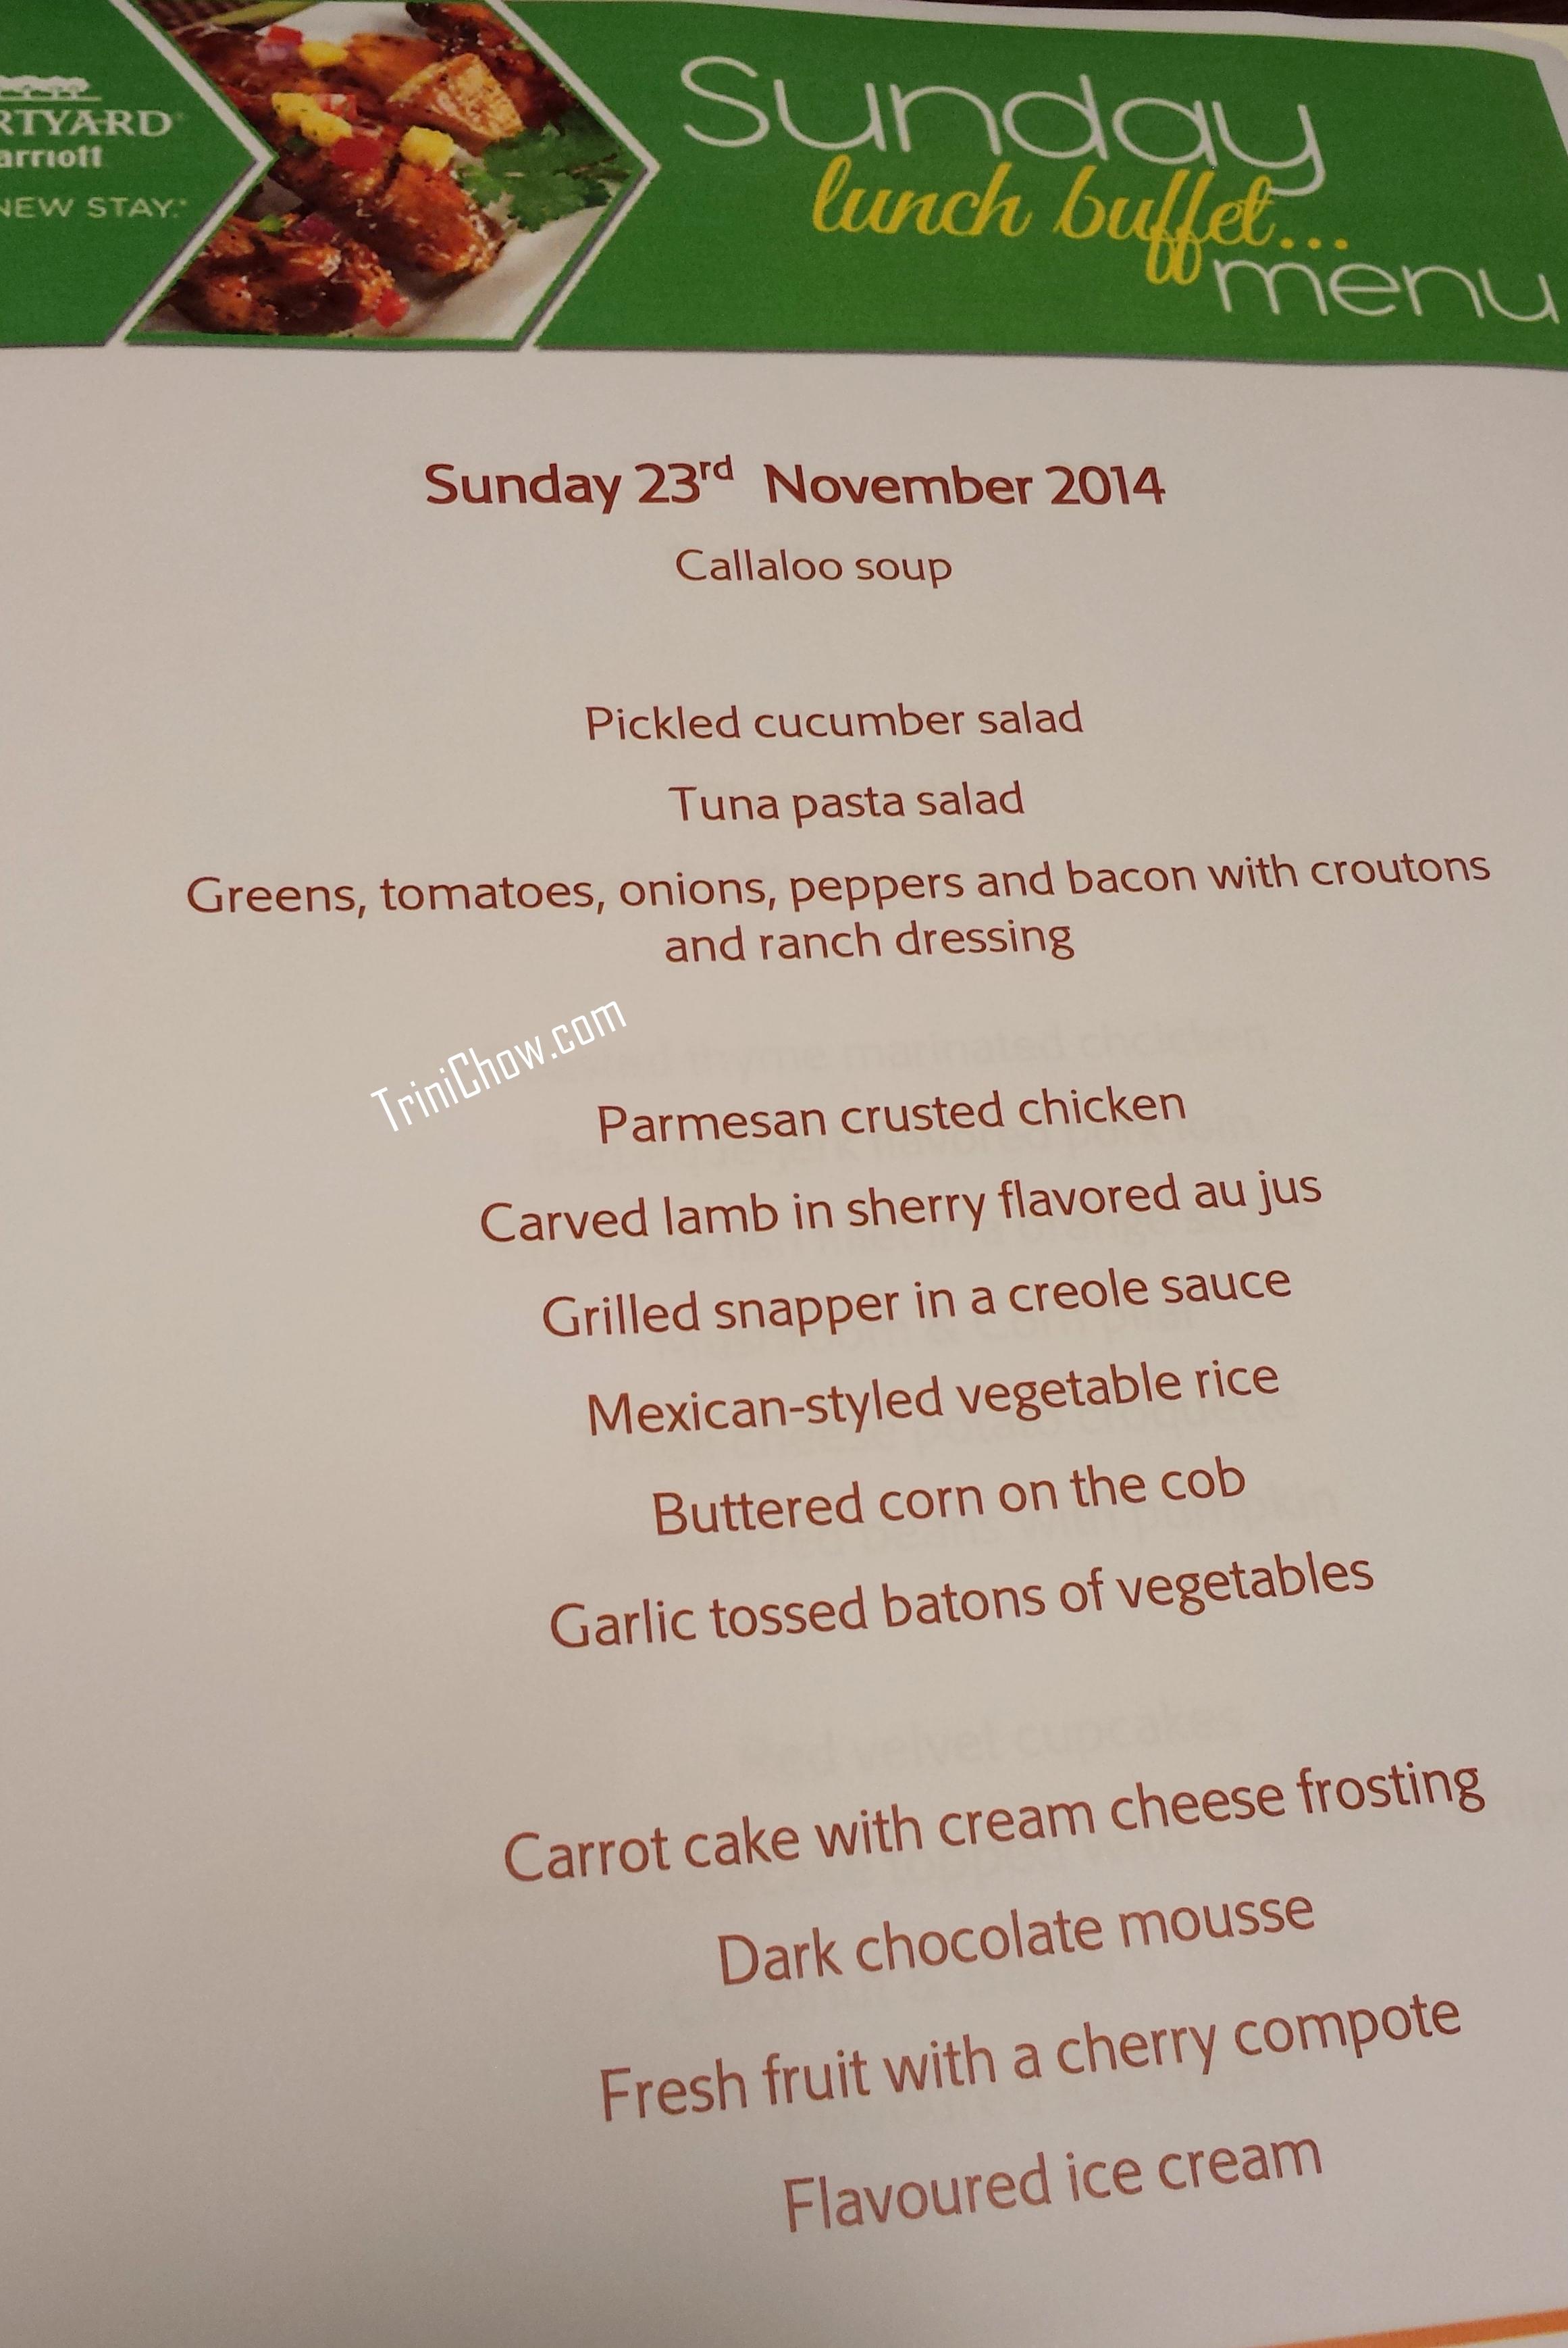 courtyard-marriott-trinidad-brunch-menu.jpg